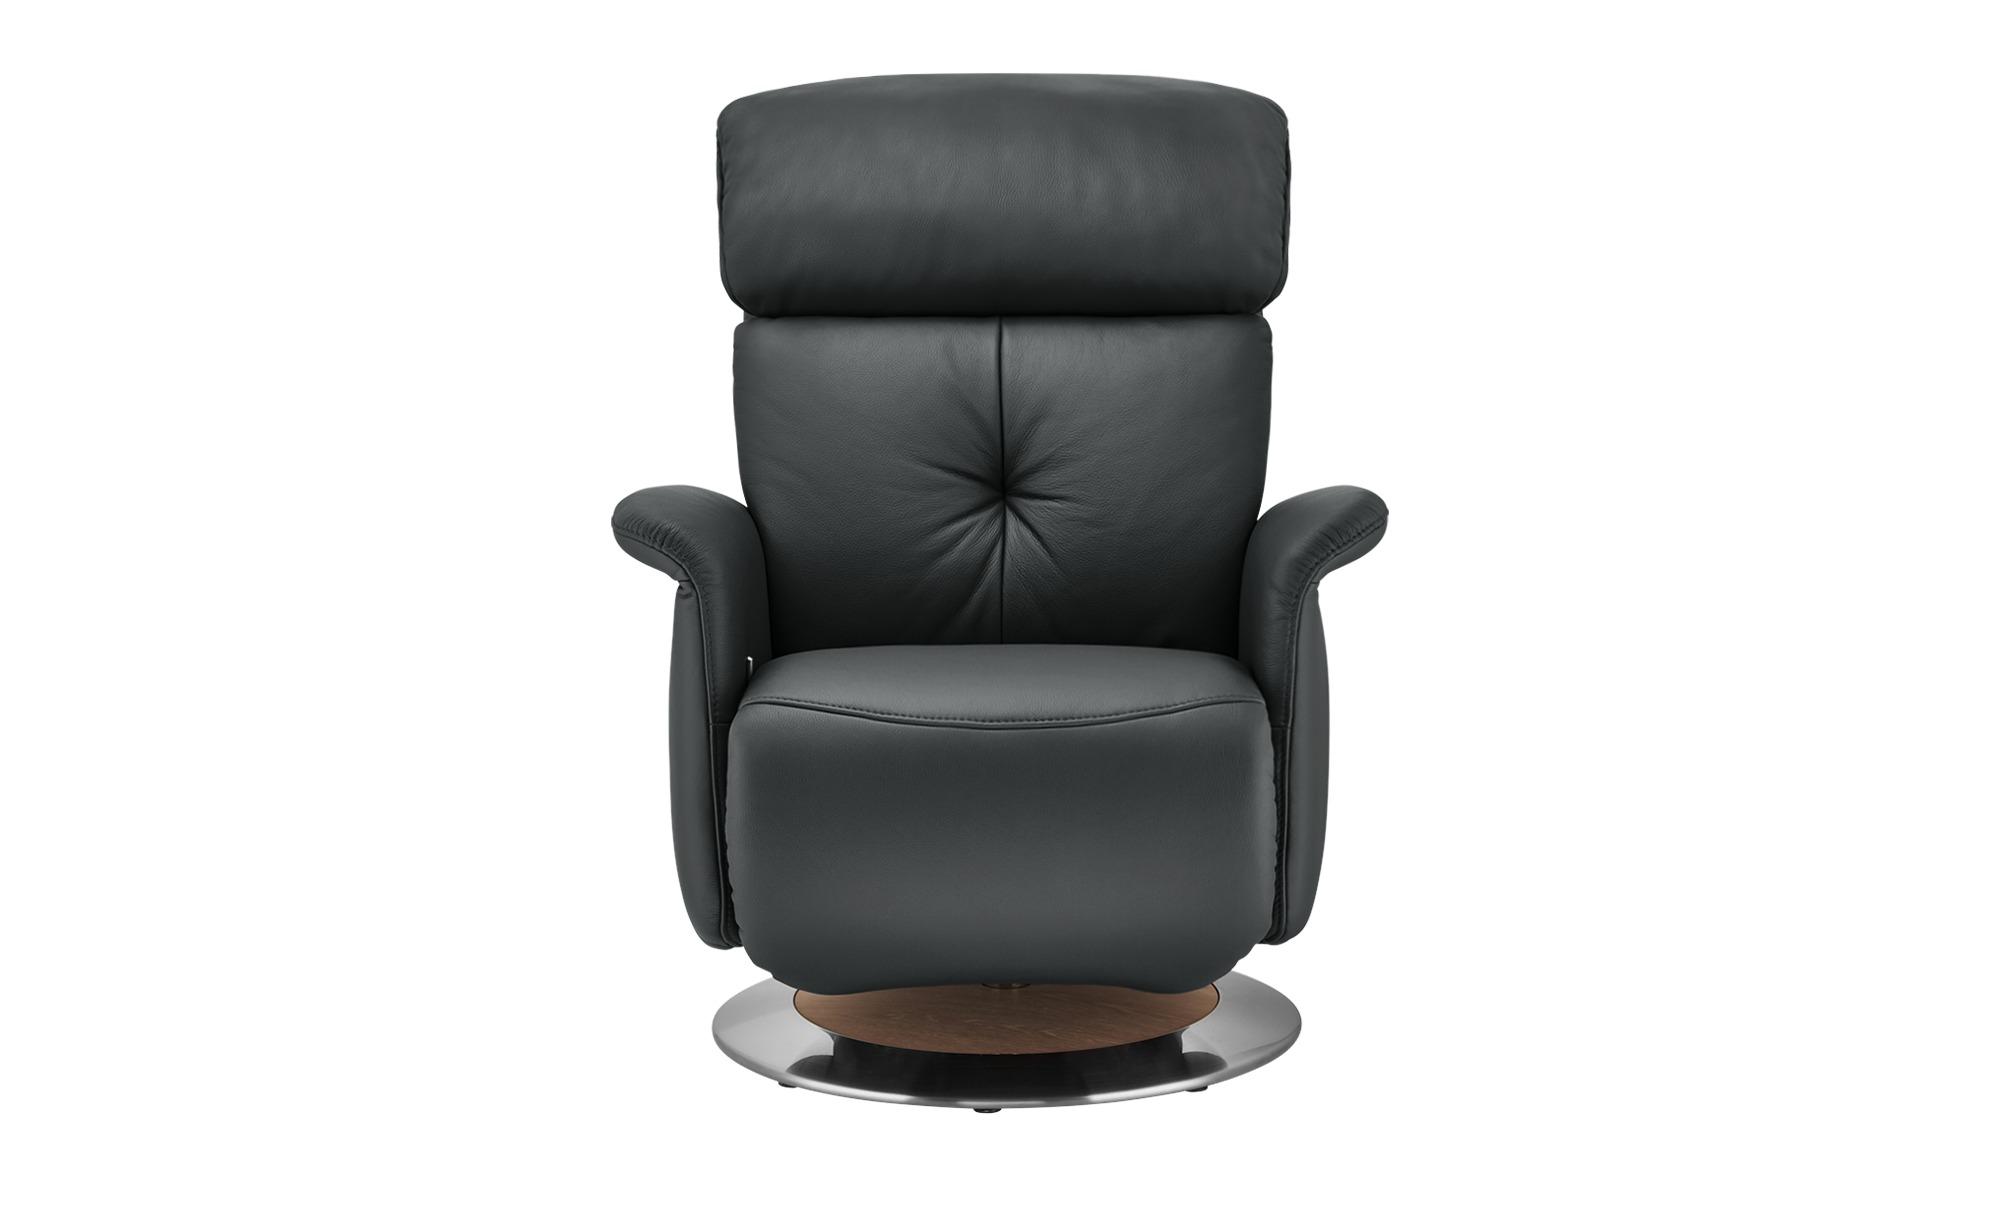 himolla Funktionssessel  7708 ¦ schwarz ¦ Maße (cm): B: 79 H: 97 T: 99 Polstermöbel > Sessel > Ledersessel - Höffner